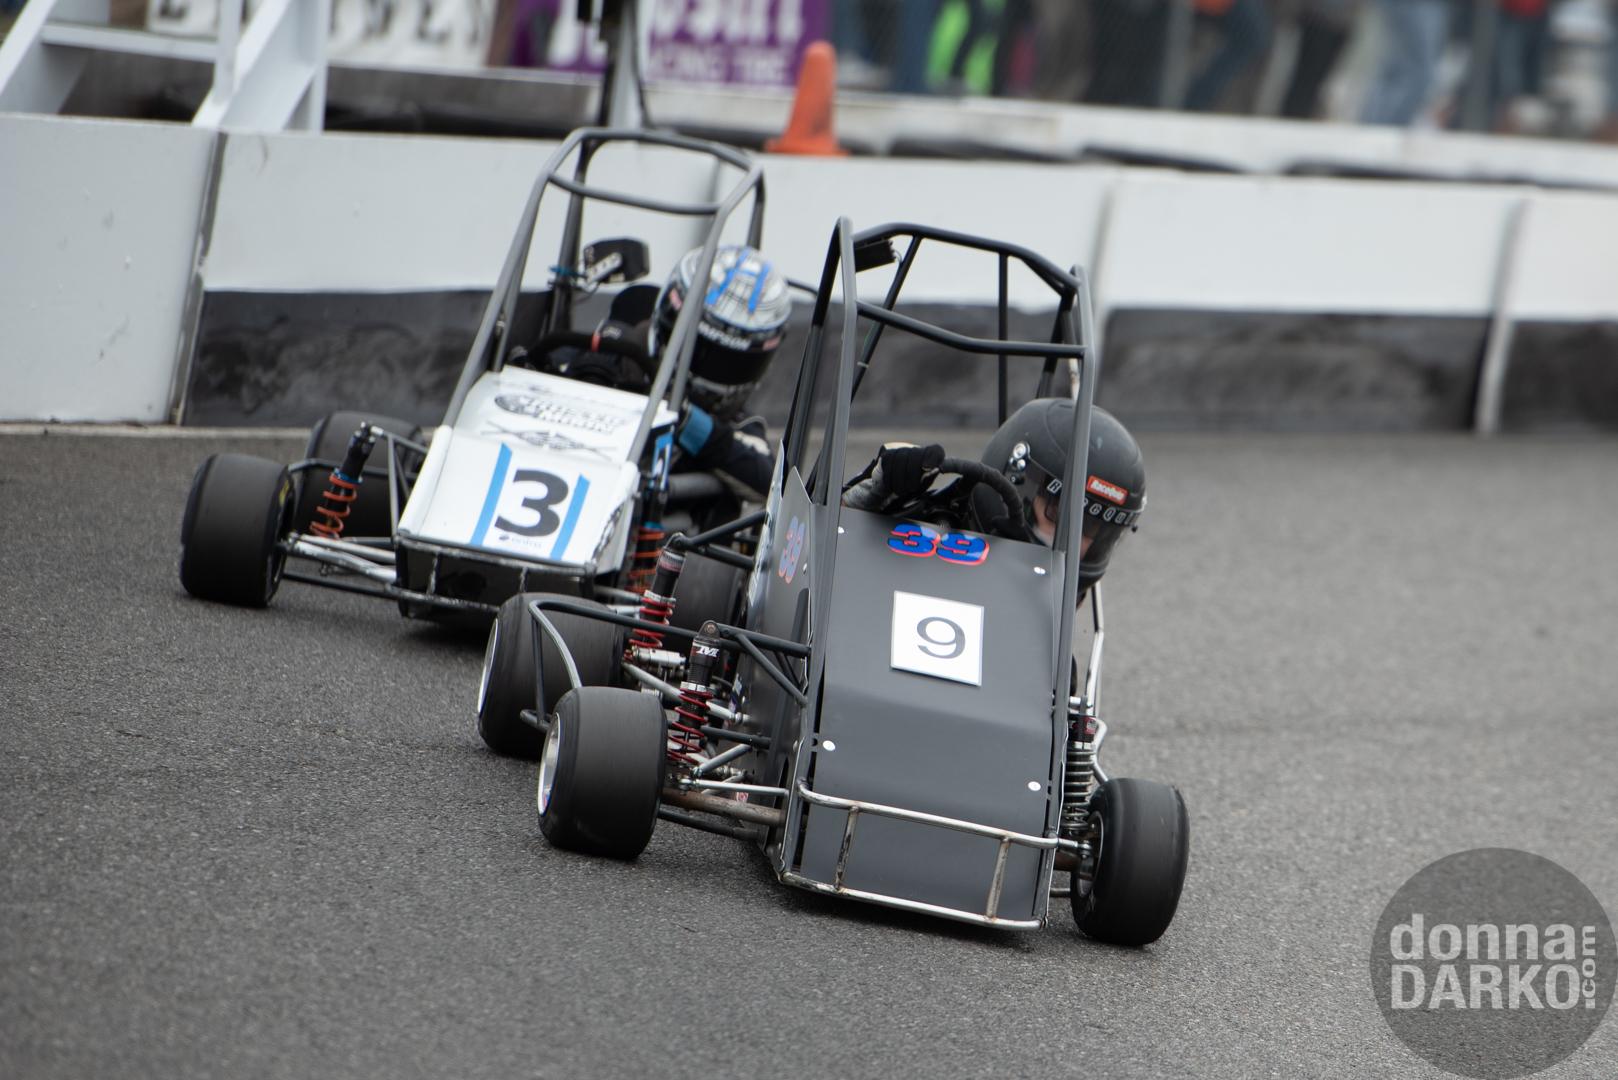 QWMA (Racing) 8-11-2019 DSC_5854.jpg